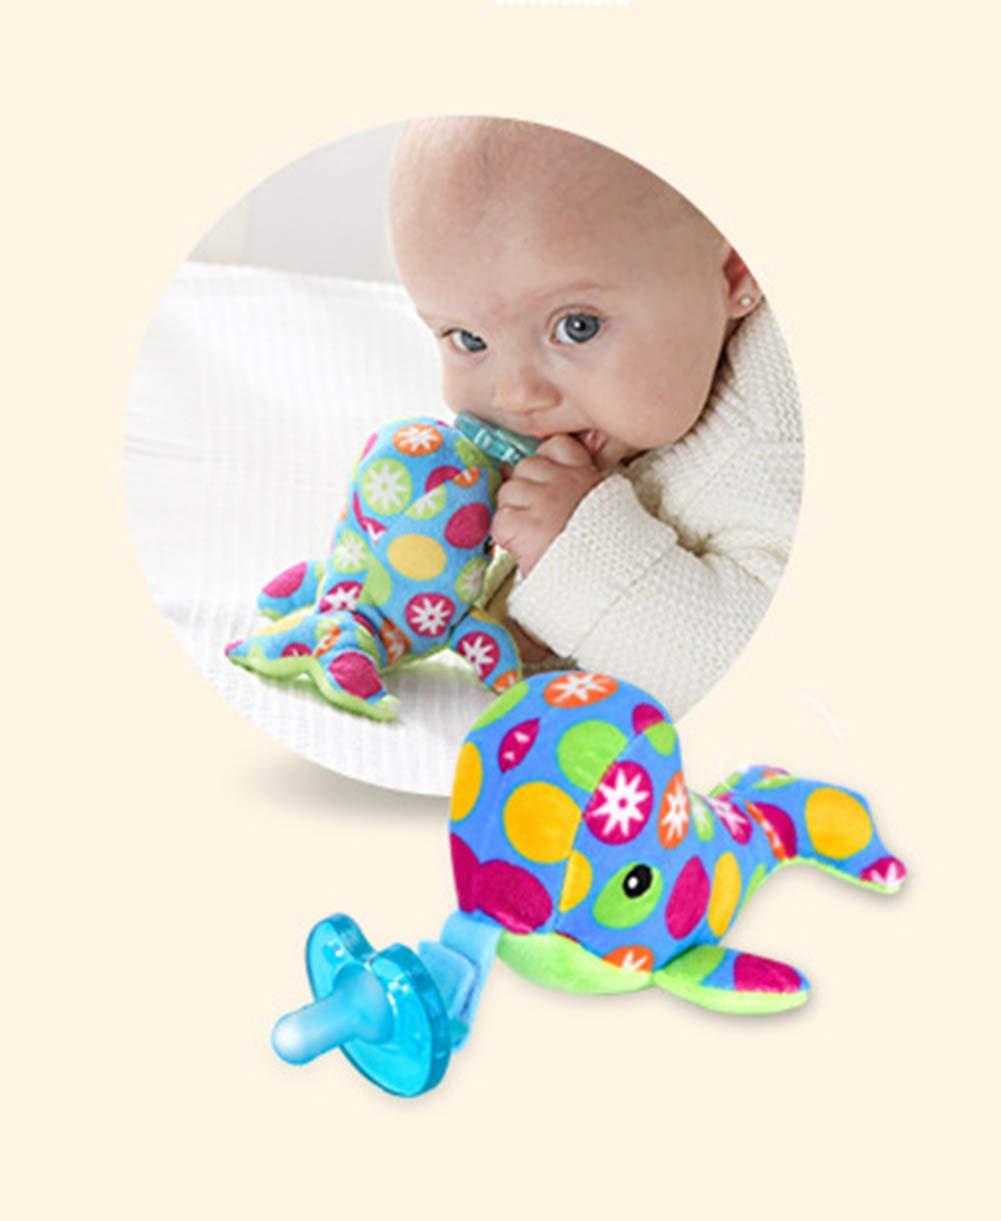 TINERS bebé Chupete Juguete Animal extraíble Peluche Juguete ...